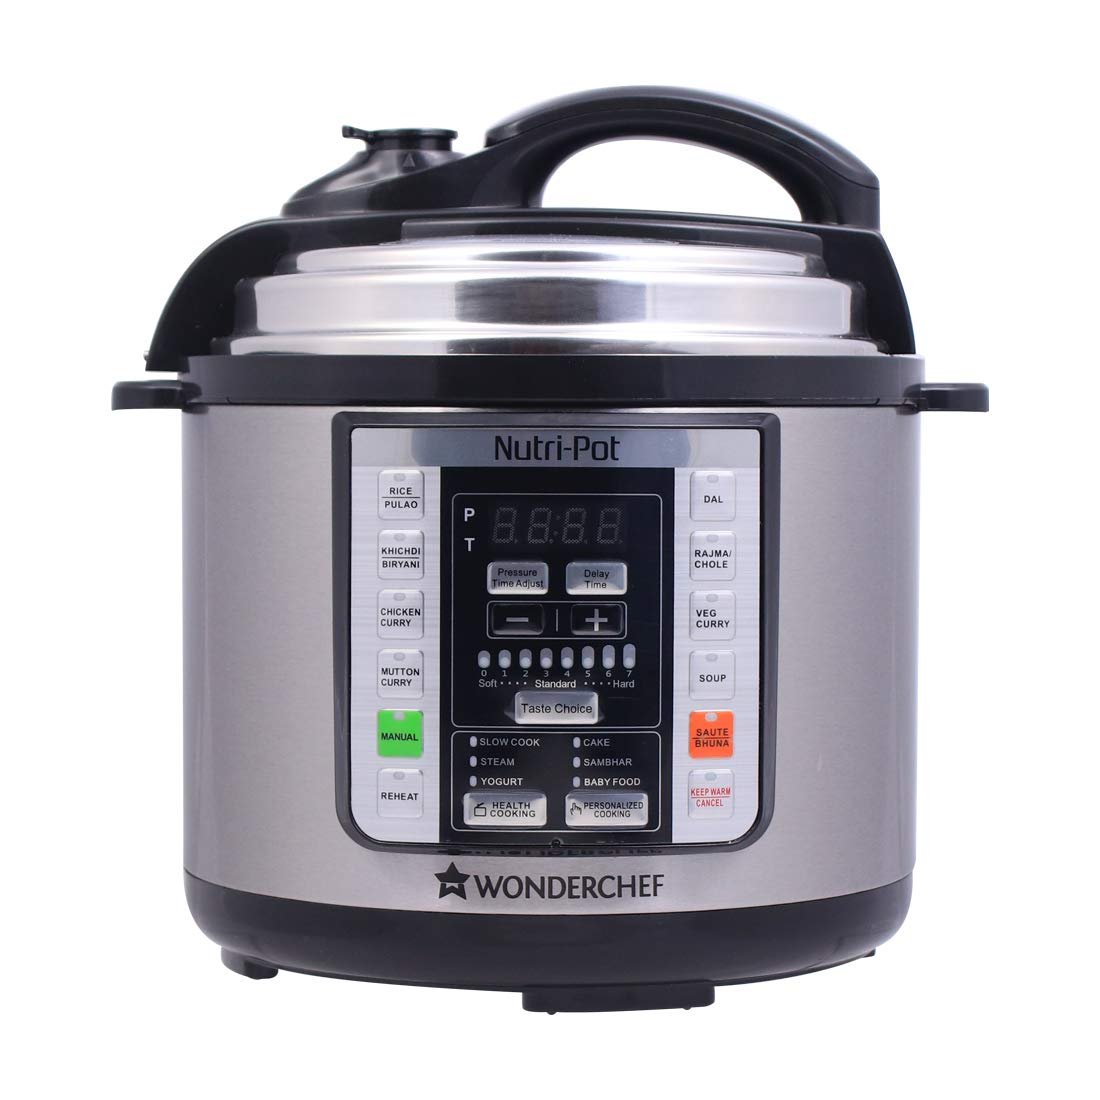 7. Wonderchef Nutri-Pot 3L 7 in 1 Programmable 18 preset Pressure Cooker